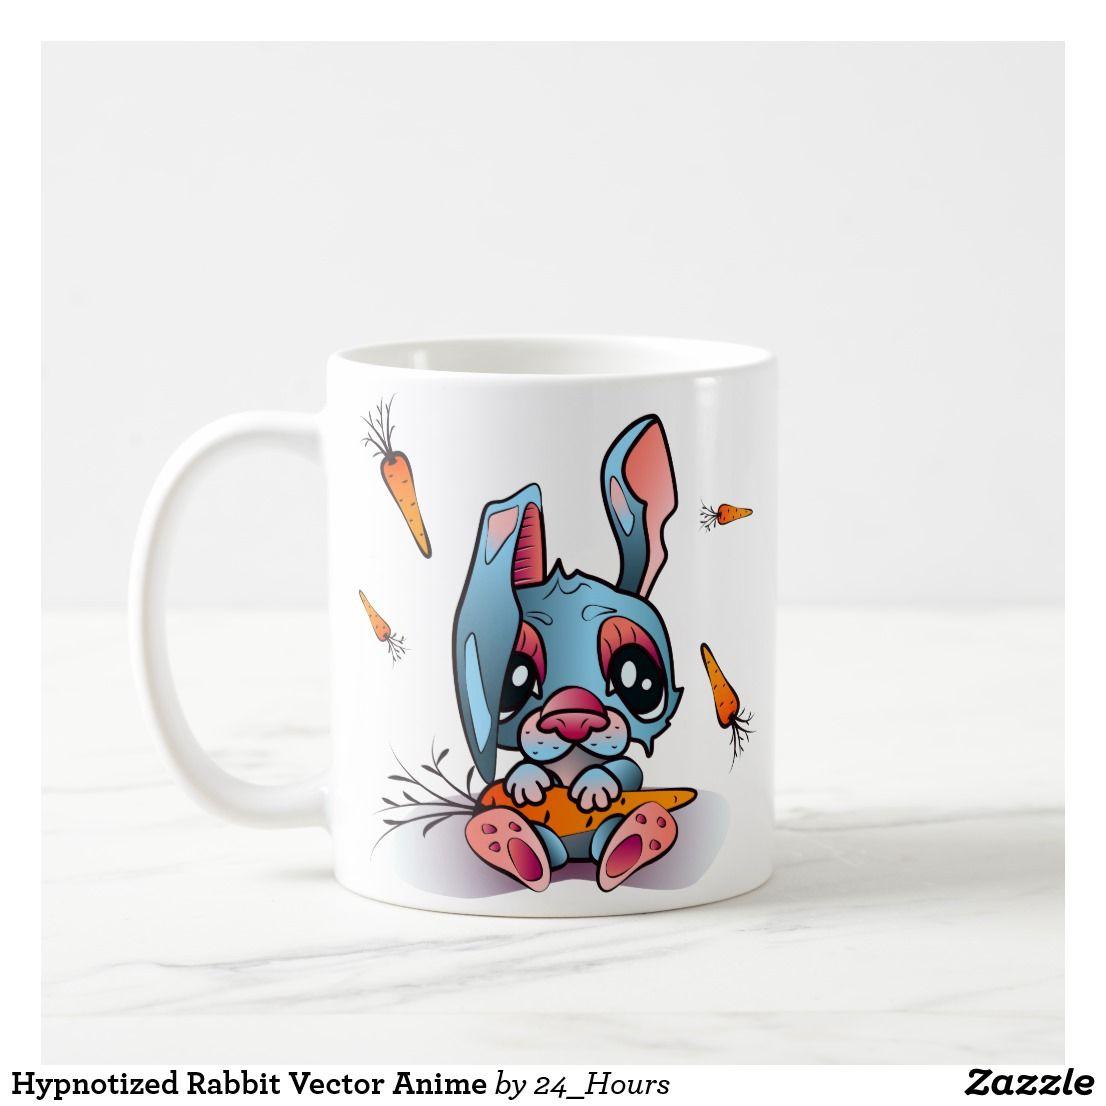 Hypnotized rabbit vector anime coffee mug mugs anime